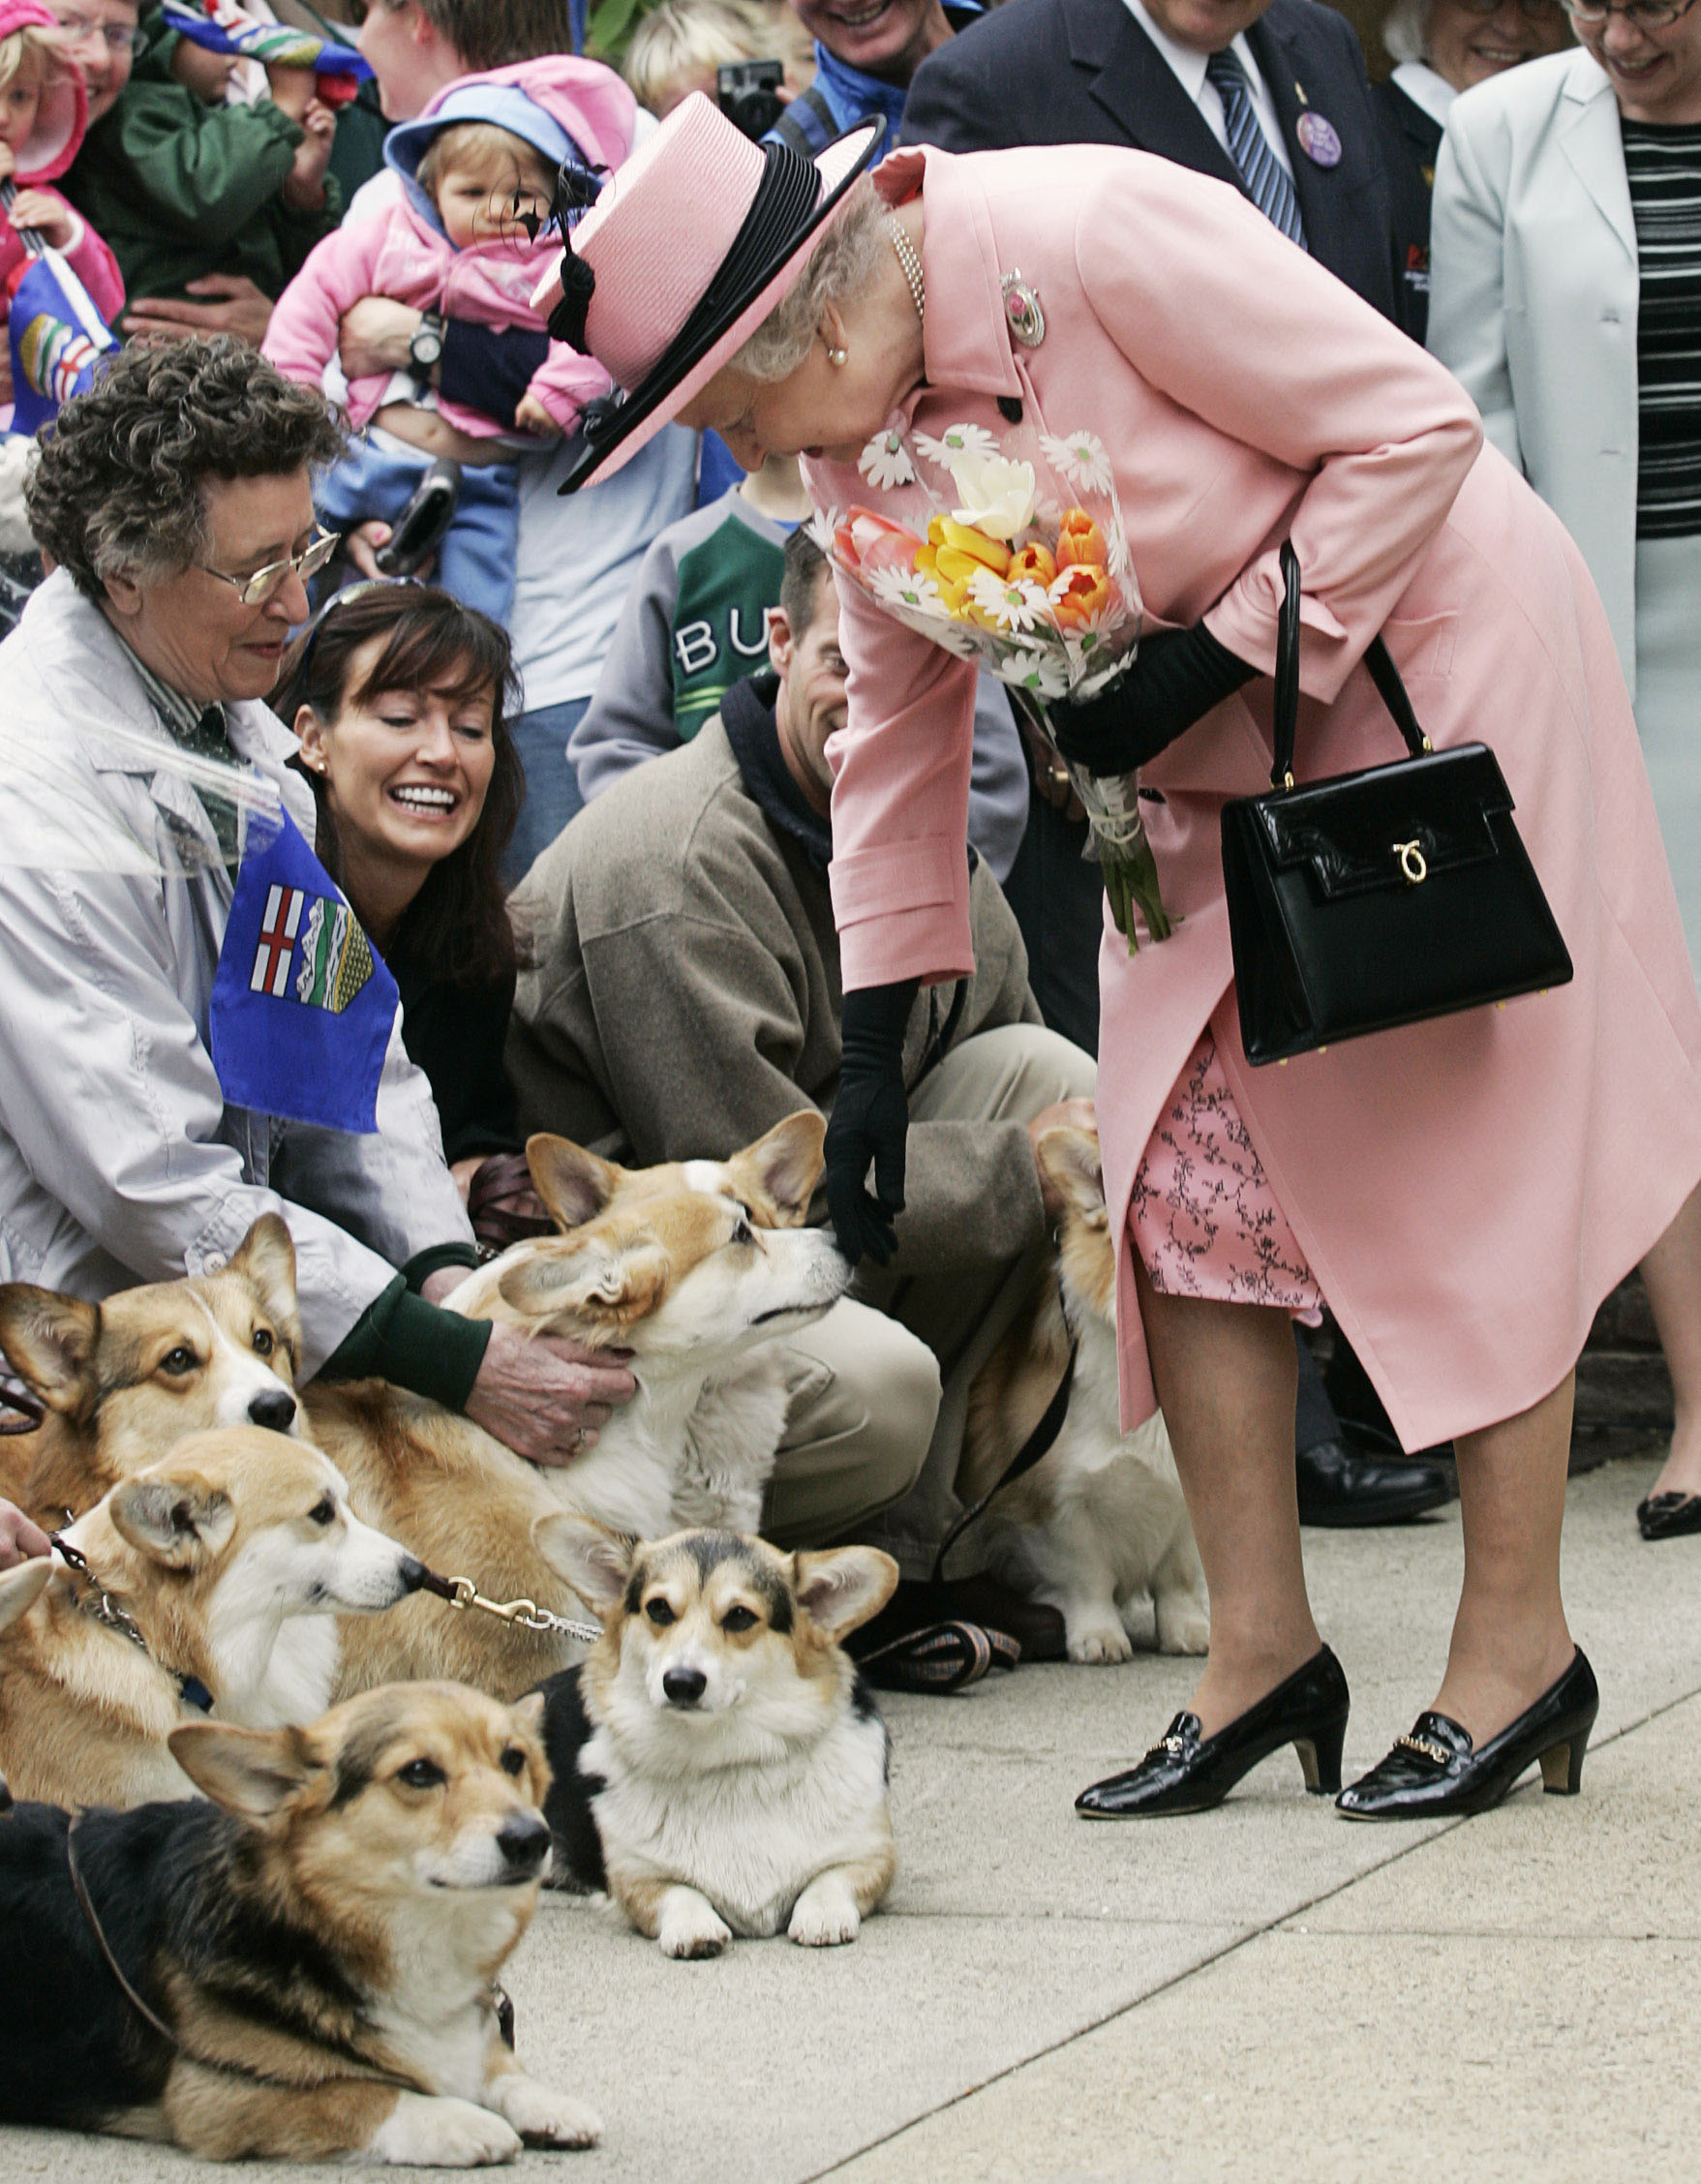 Queen Elizabeth stops to pet sveral corgi dogs while visiting the Alberta Legislature